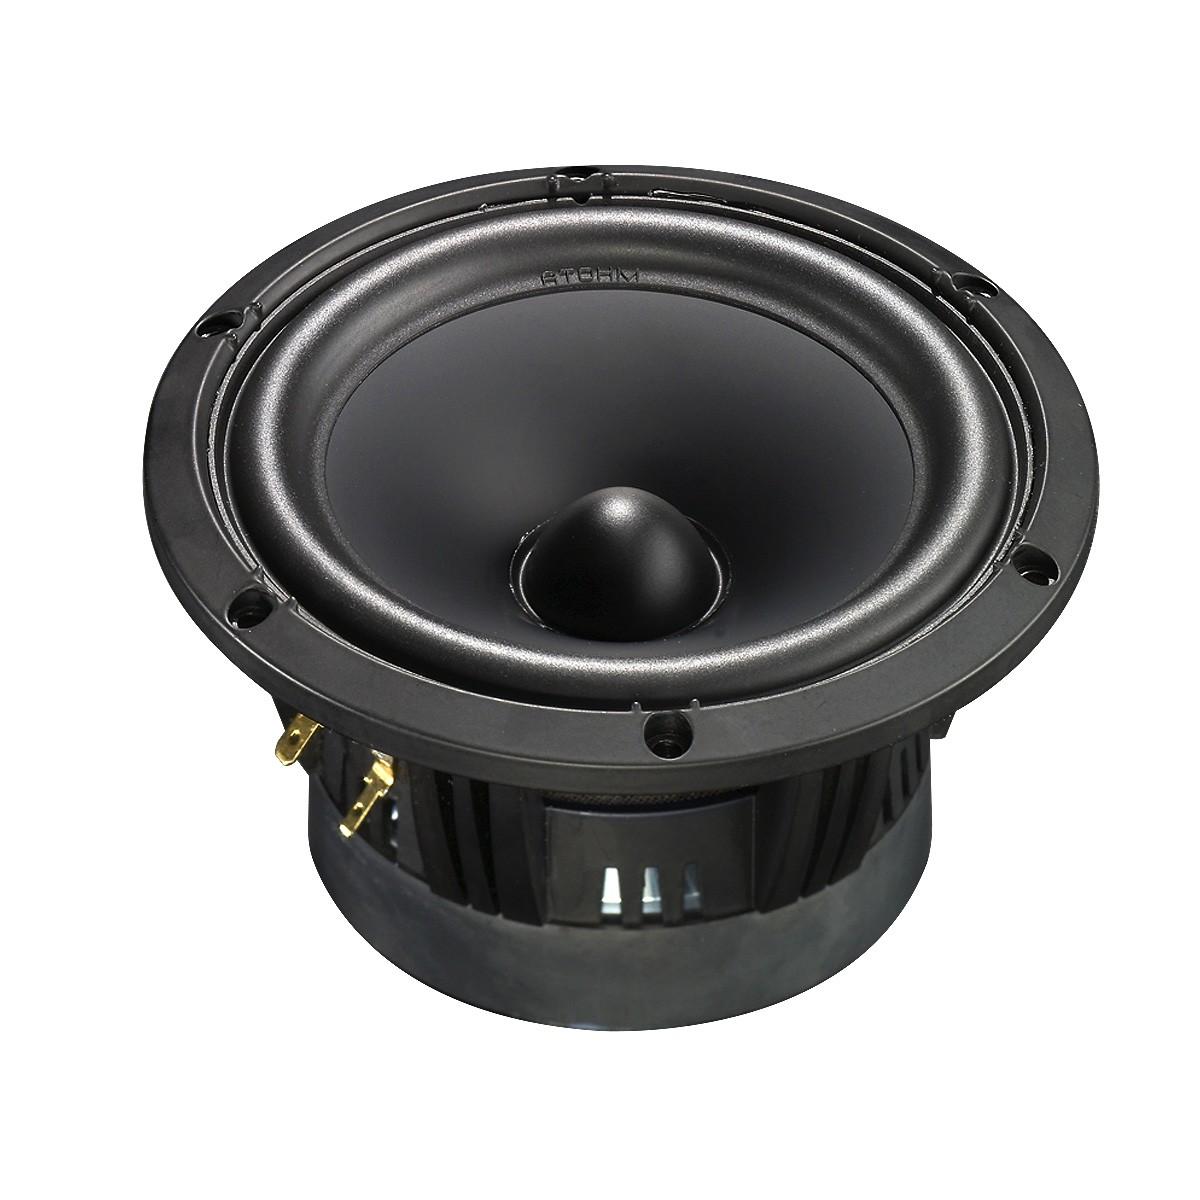 ATOHM LD150CR04 Speaker Driver Midbass 100W 4 Ohm 91dB Ø15cm